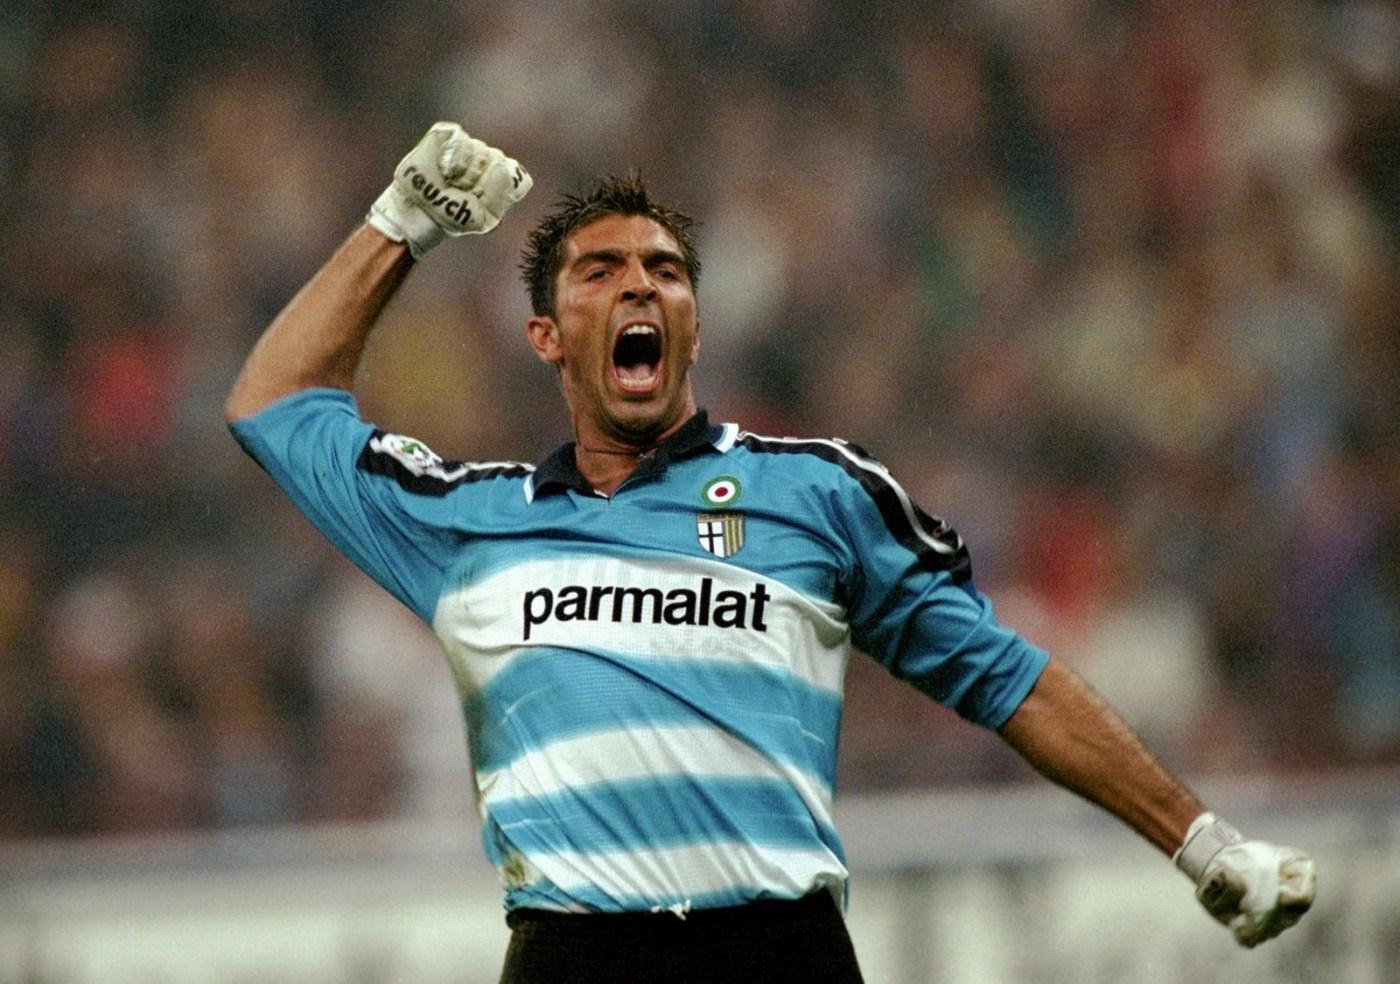 19 Sep 1999: Parma's Gianluigi Buffon celebrates during the Serie A match between Inter Milan and Parma played at the San Siro in Milan, Italy. Inter won the match 5-1. Mandatory Credit: Claudio Villa /Allsport